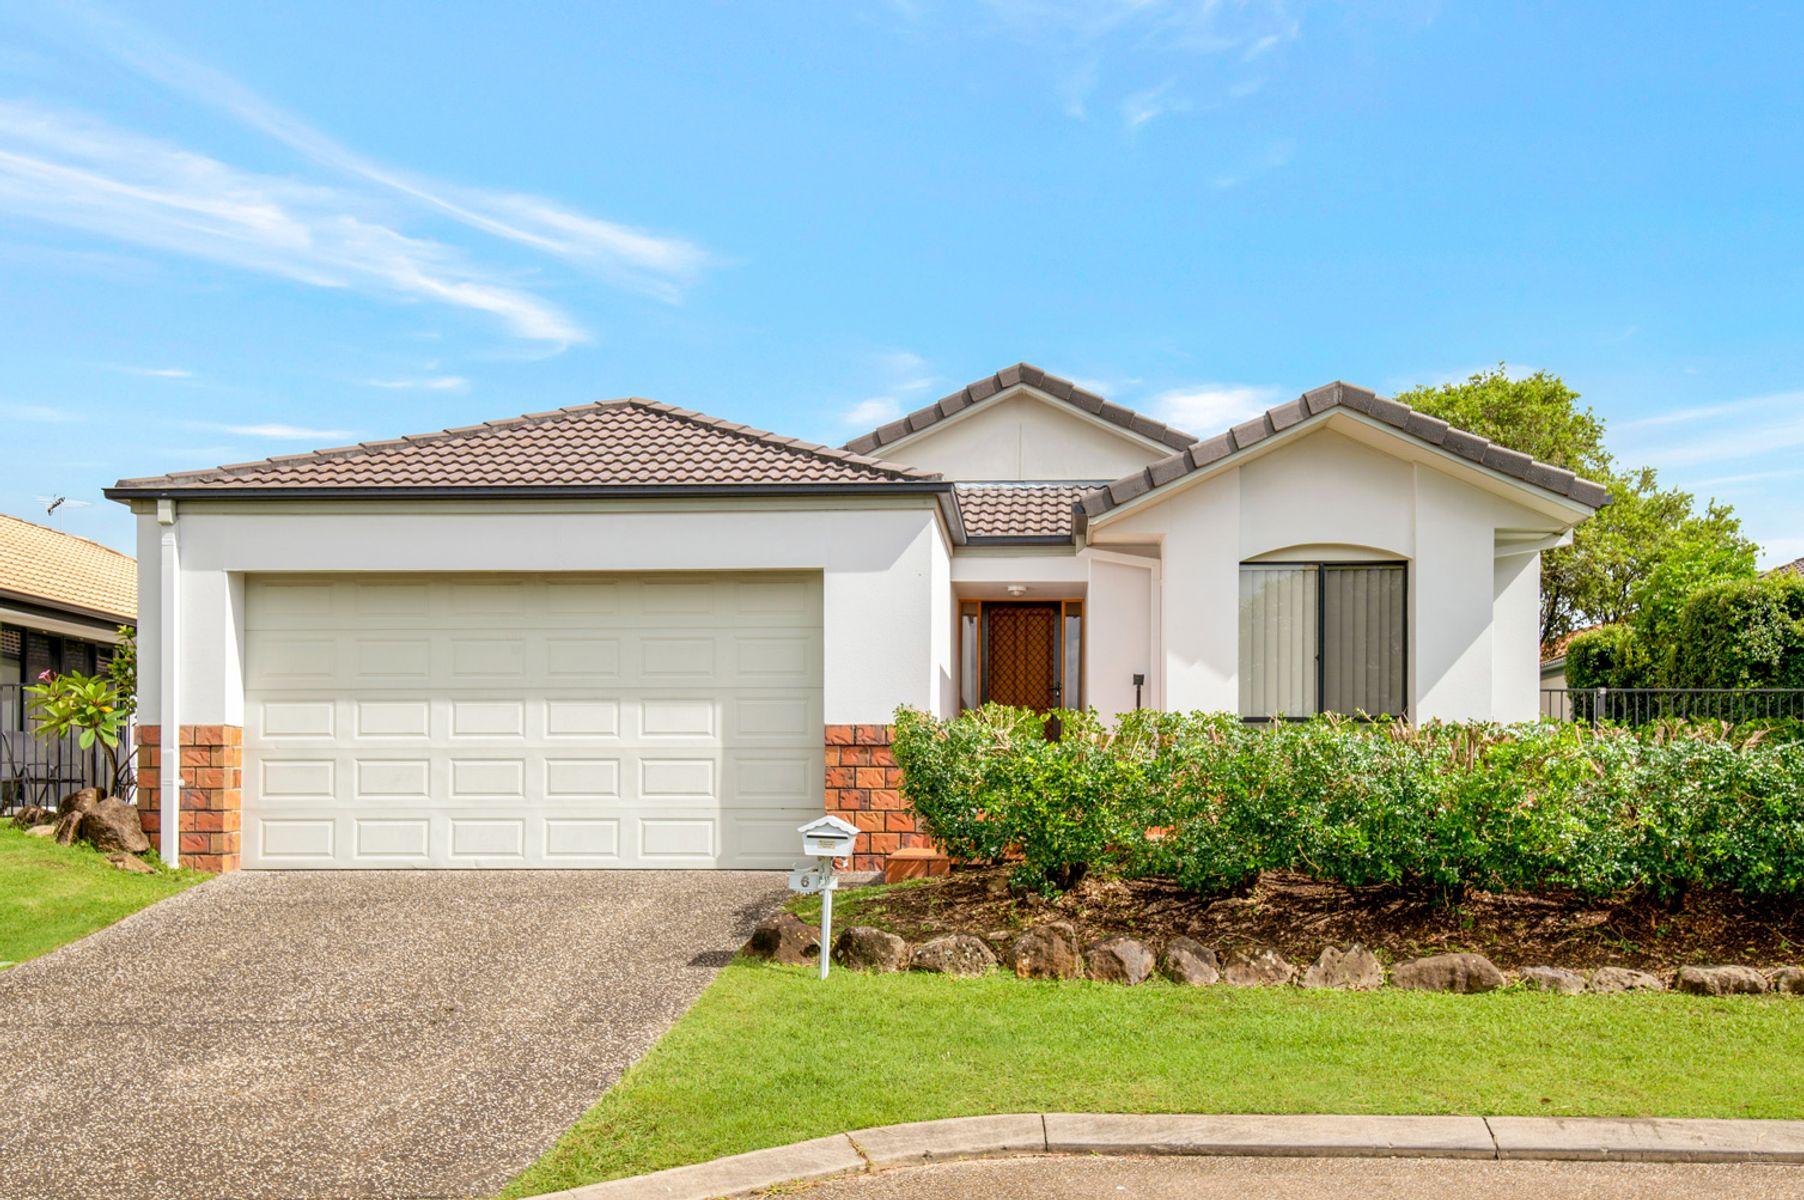 6 Picabeen Close, Robina, QLD 4226